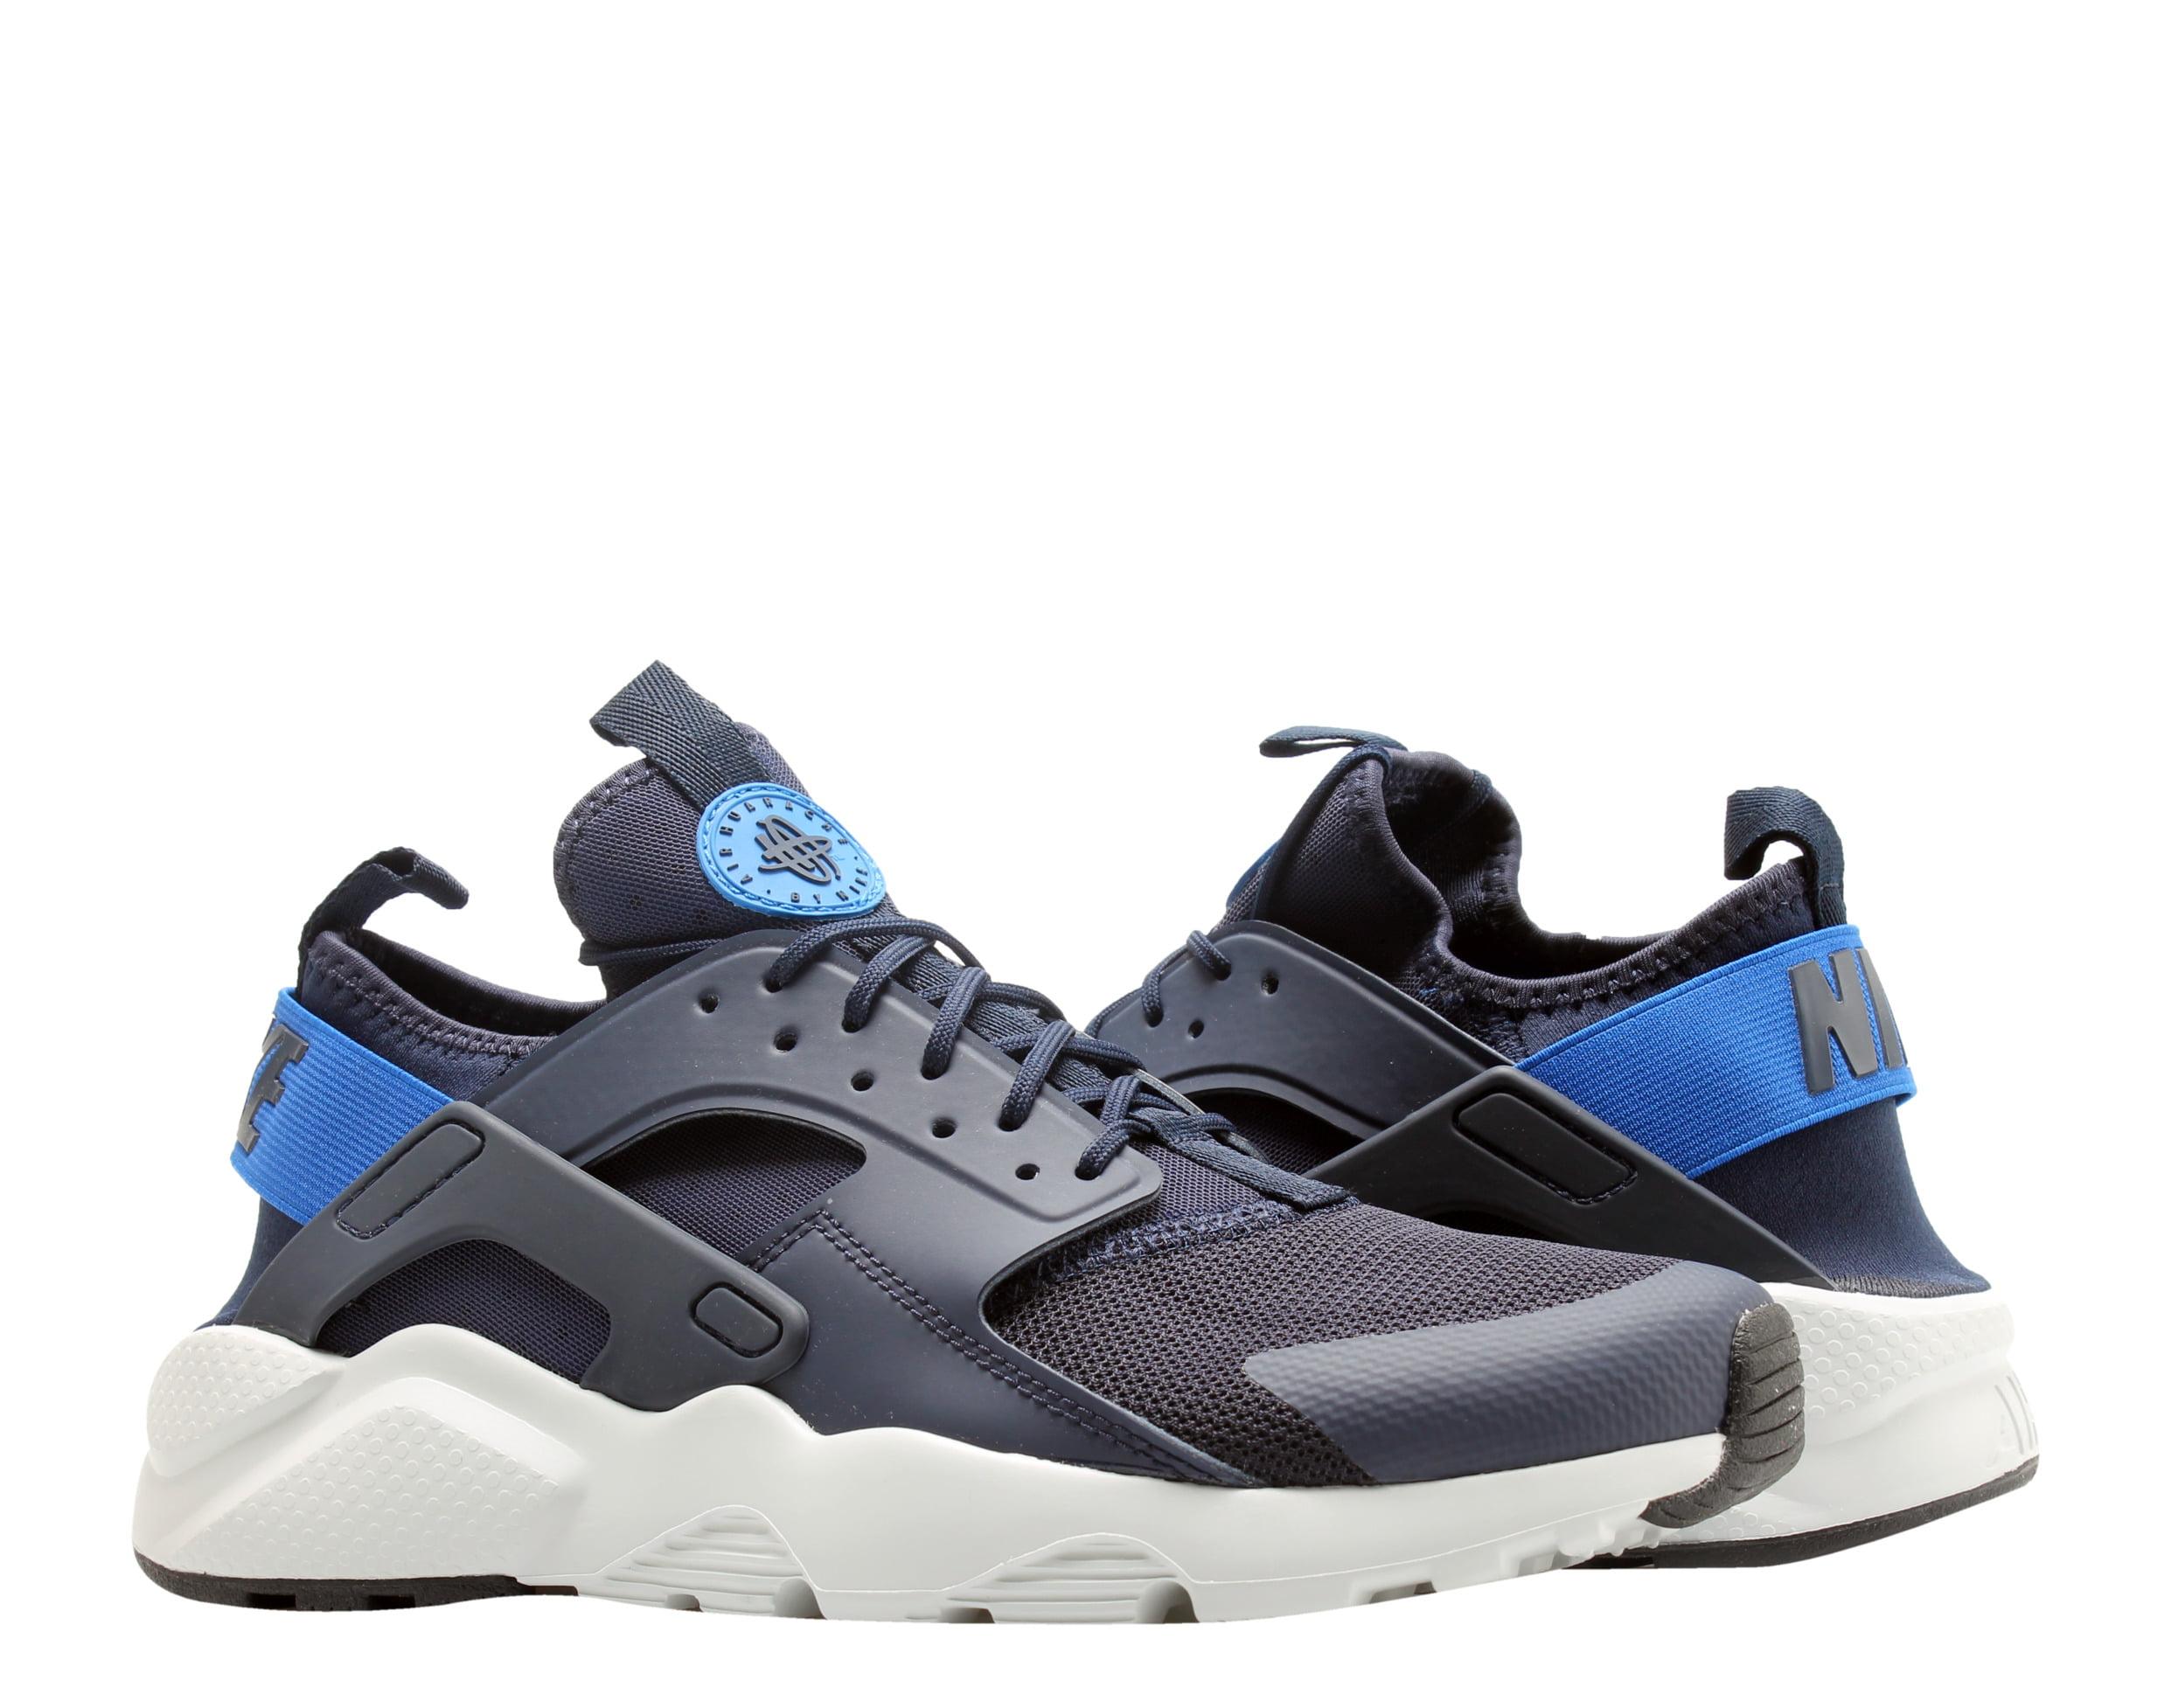 Nike - Nike Air Huarache Run Ultra Obsidian/Signal Blue Men's Running Shoes 819685-412 - Walmart.com